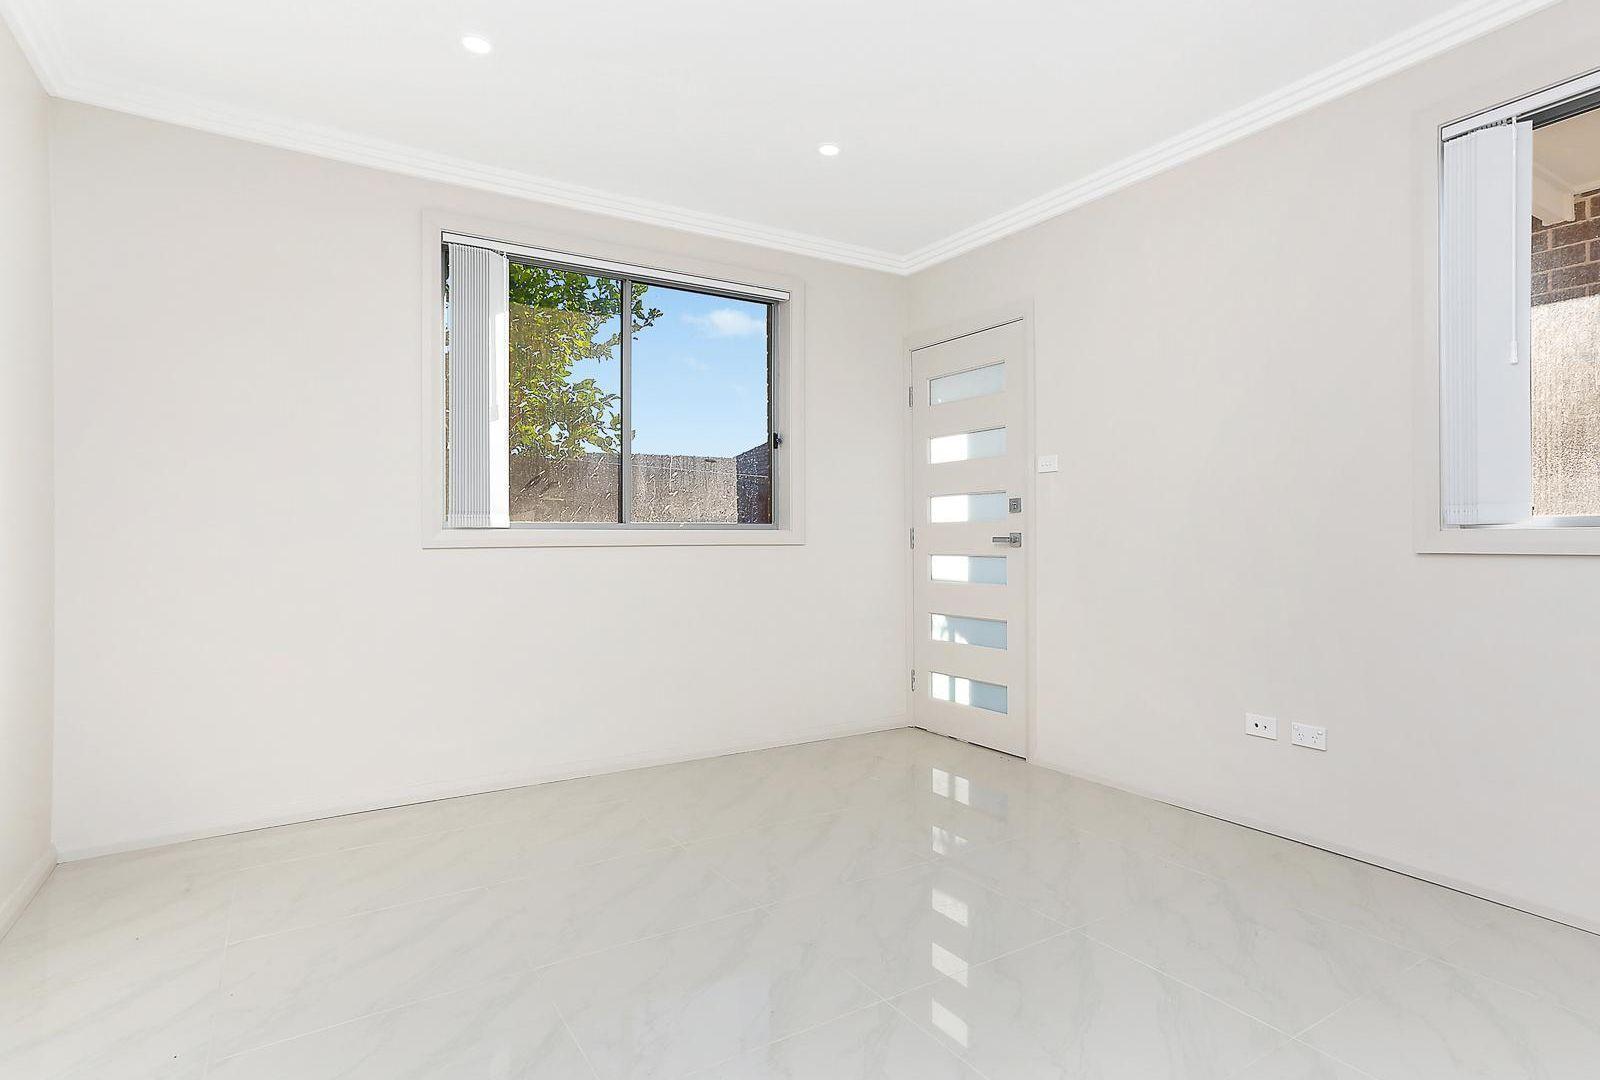 73A New Illawarra Road, Bexley North NSW 2207, Image 1